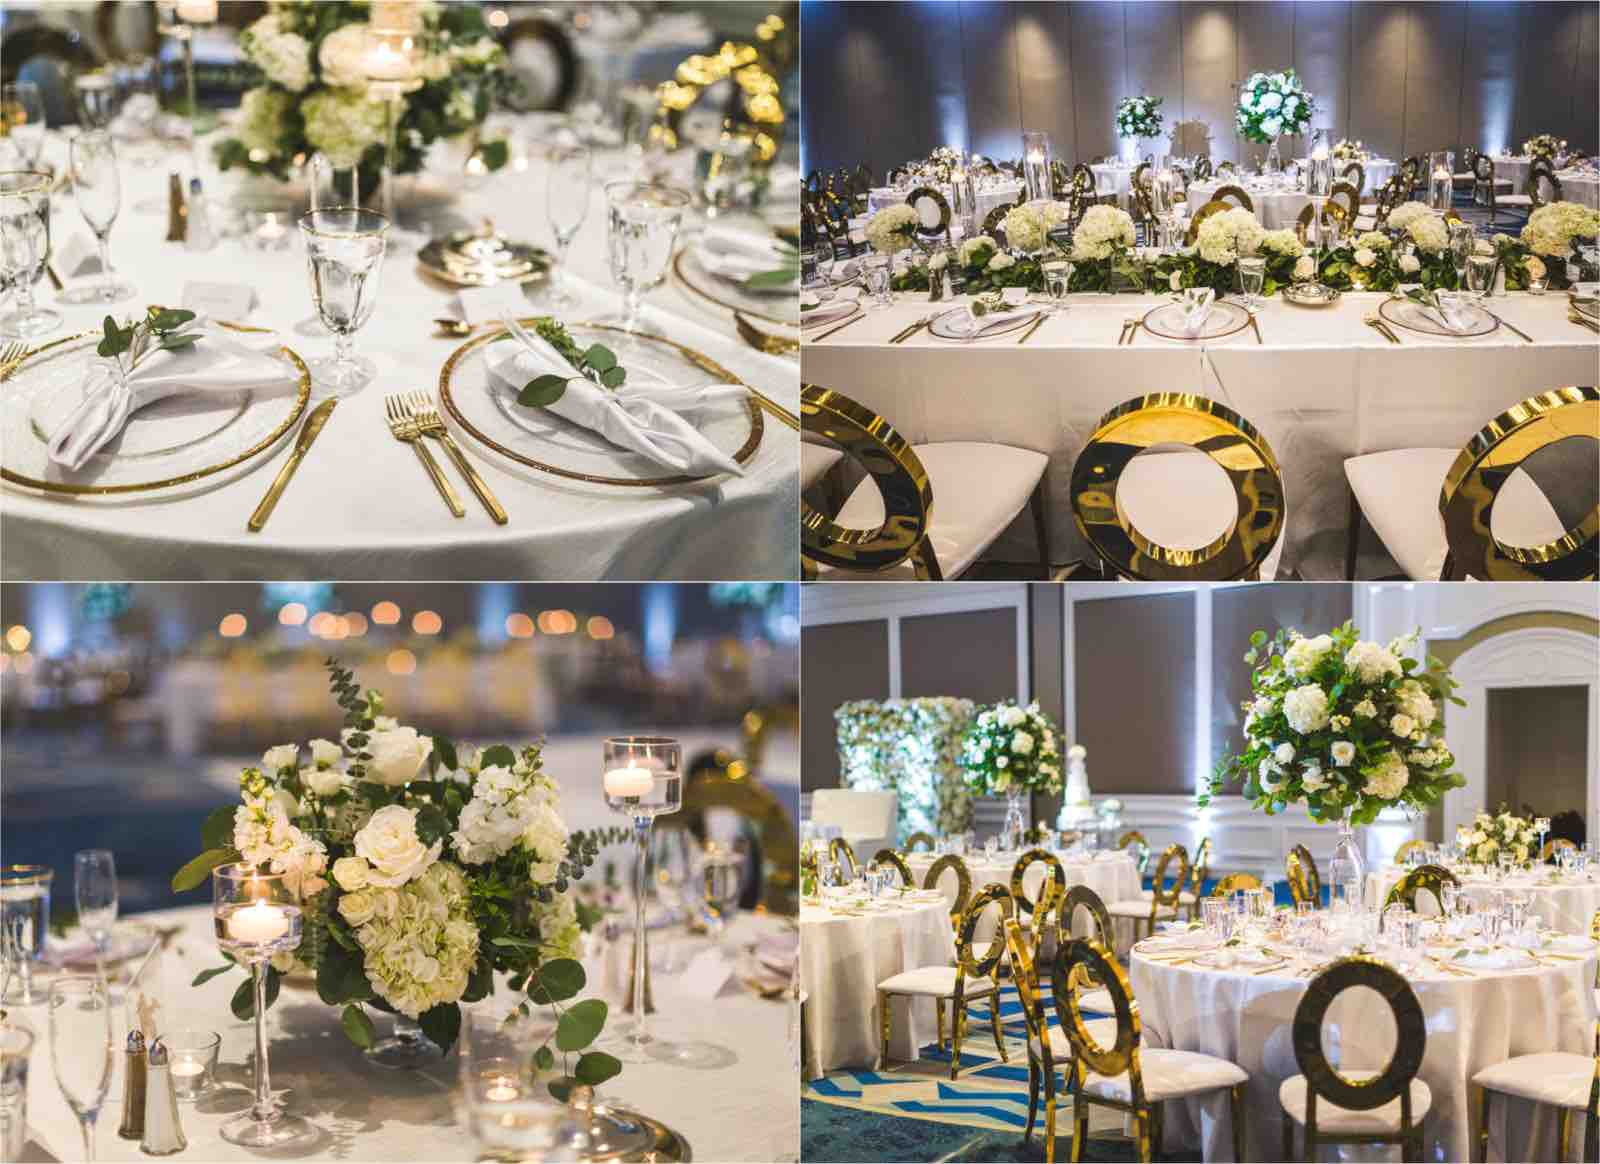 Ritz Carlton Sarasota wedding a chair affair Gold Rim Chargers and Gold Flatware